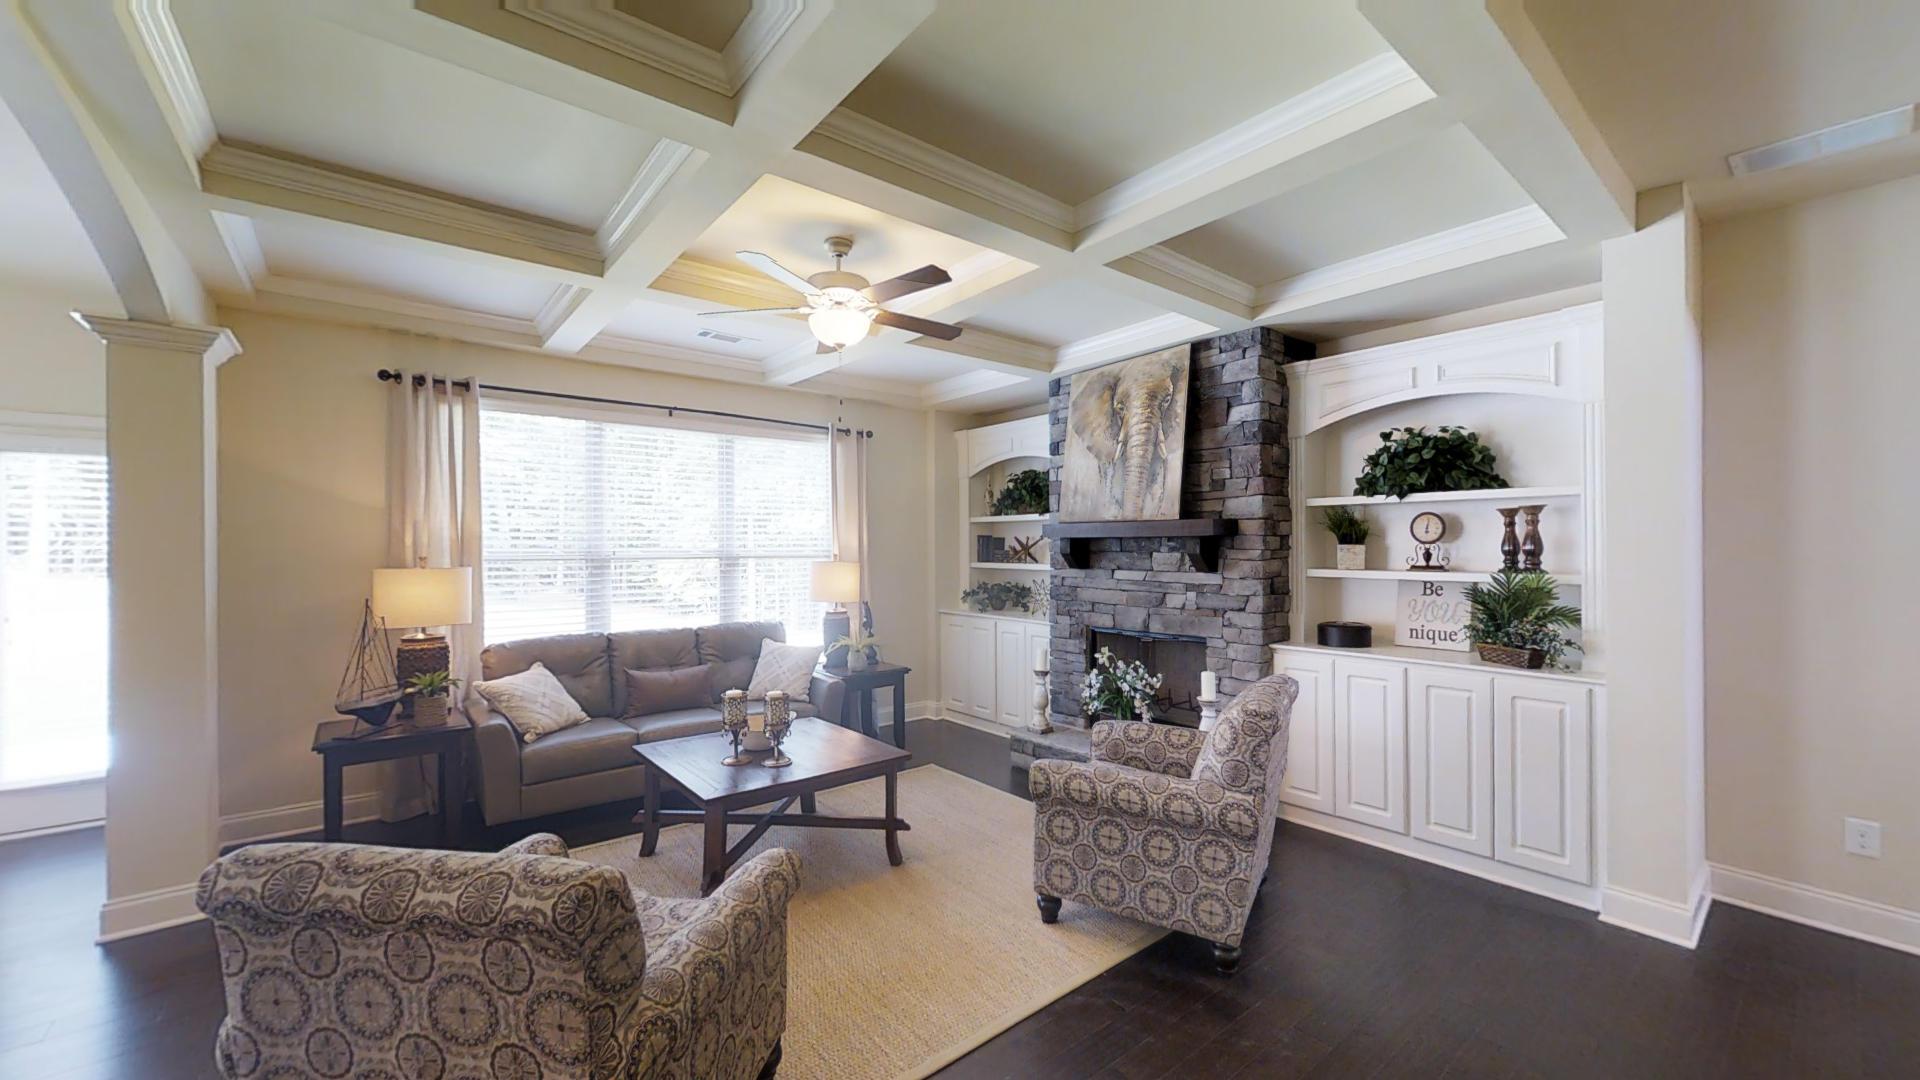 Kerley Family Homes presents Montclair